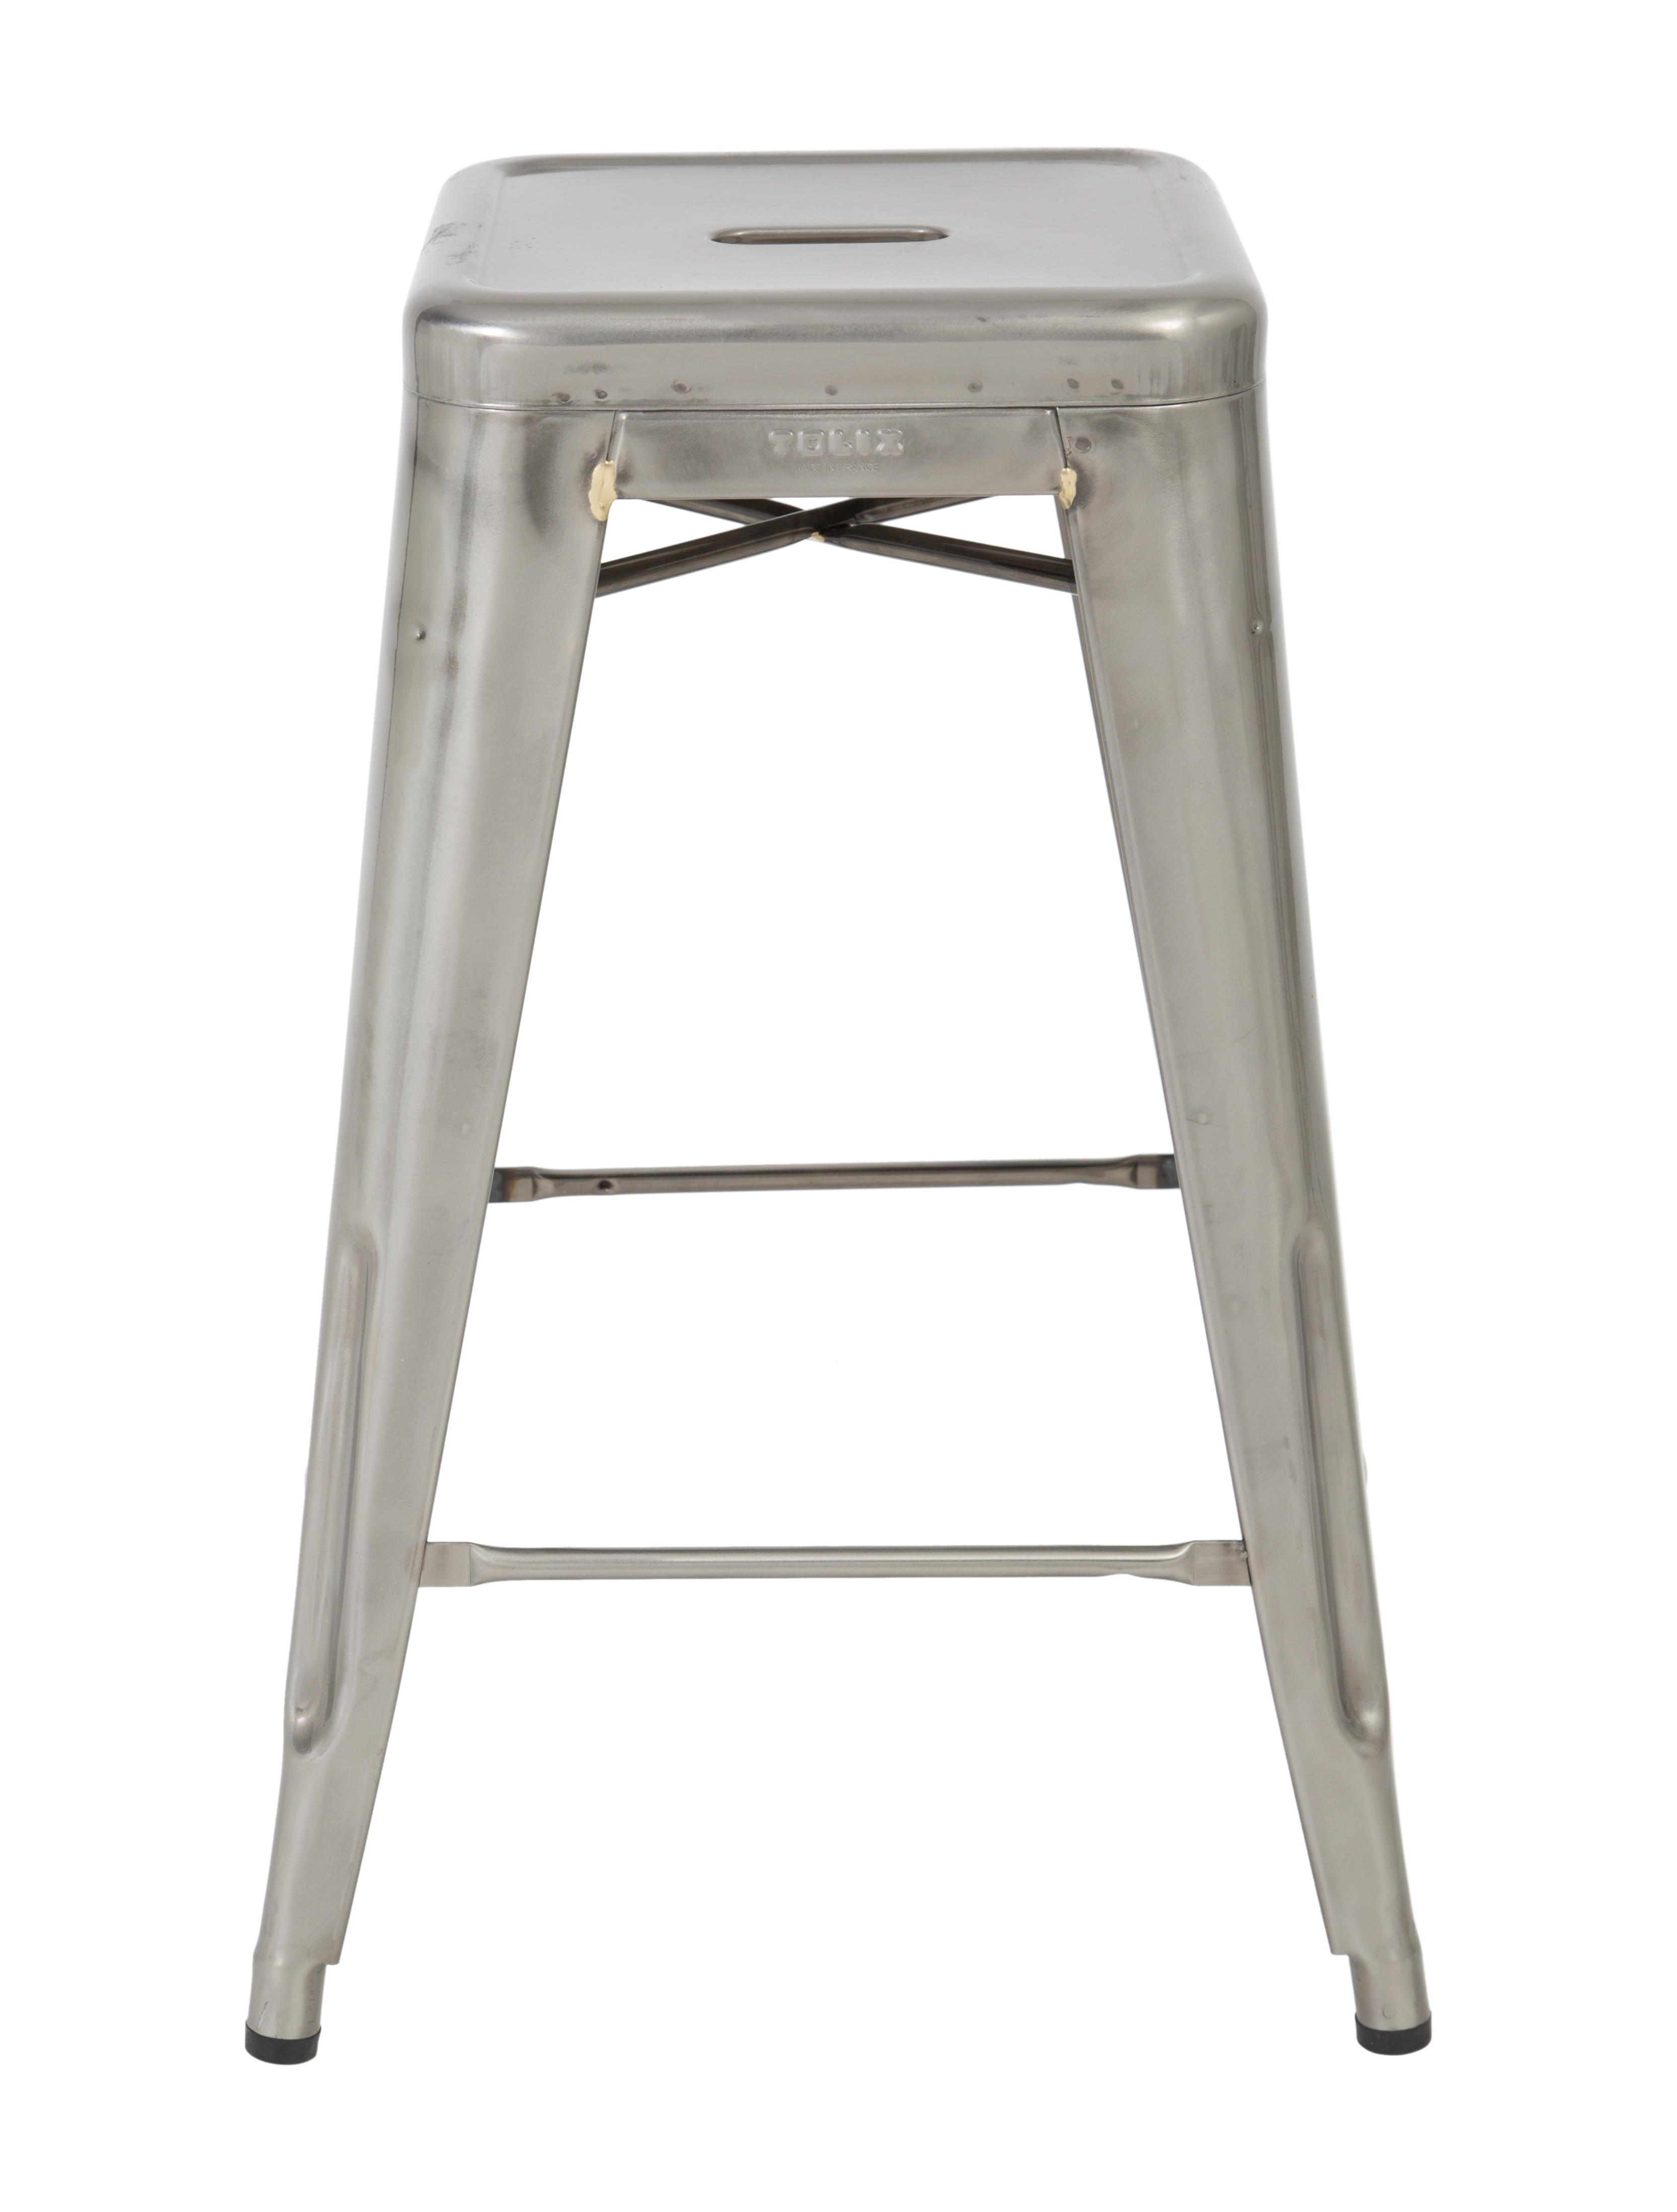 Tolix marais counter stools furniture furni20414 the realreal - Tolix marais counter stool ...